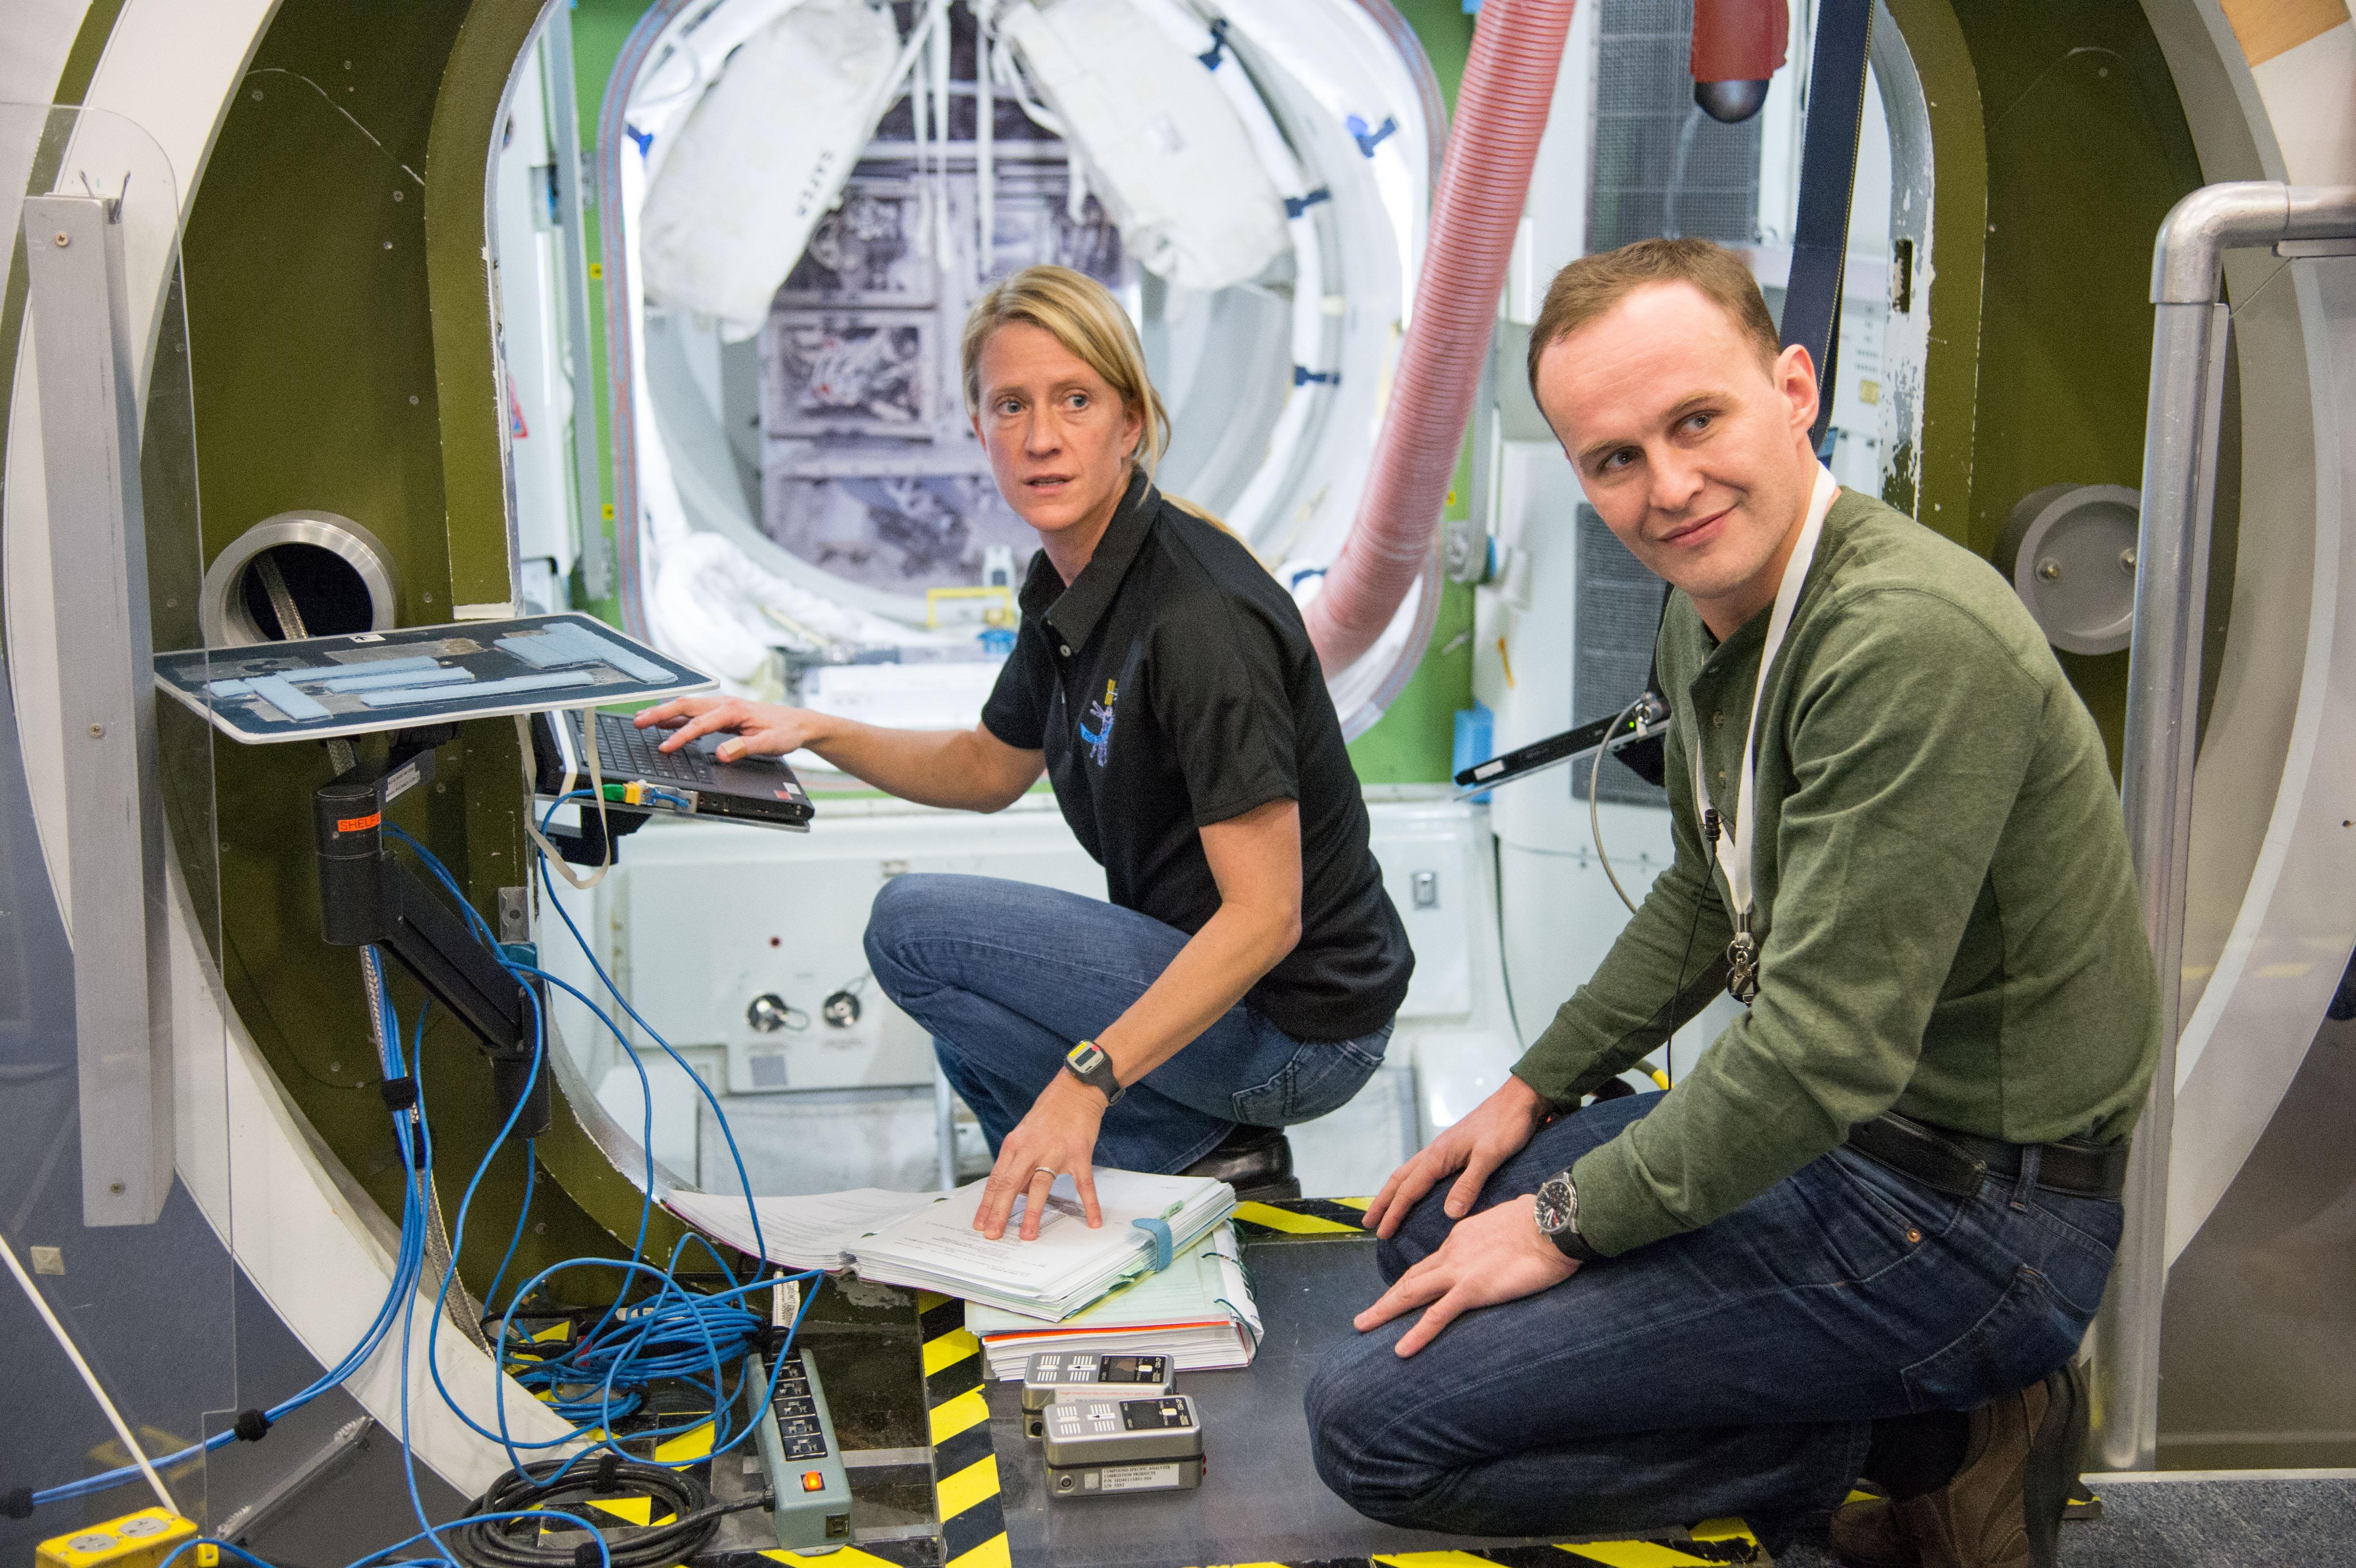 Nyberg and Ryzansky Take Part in Emergency Scenario Training